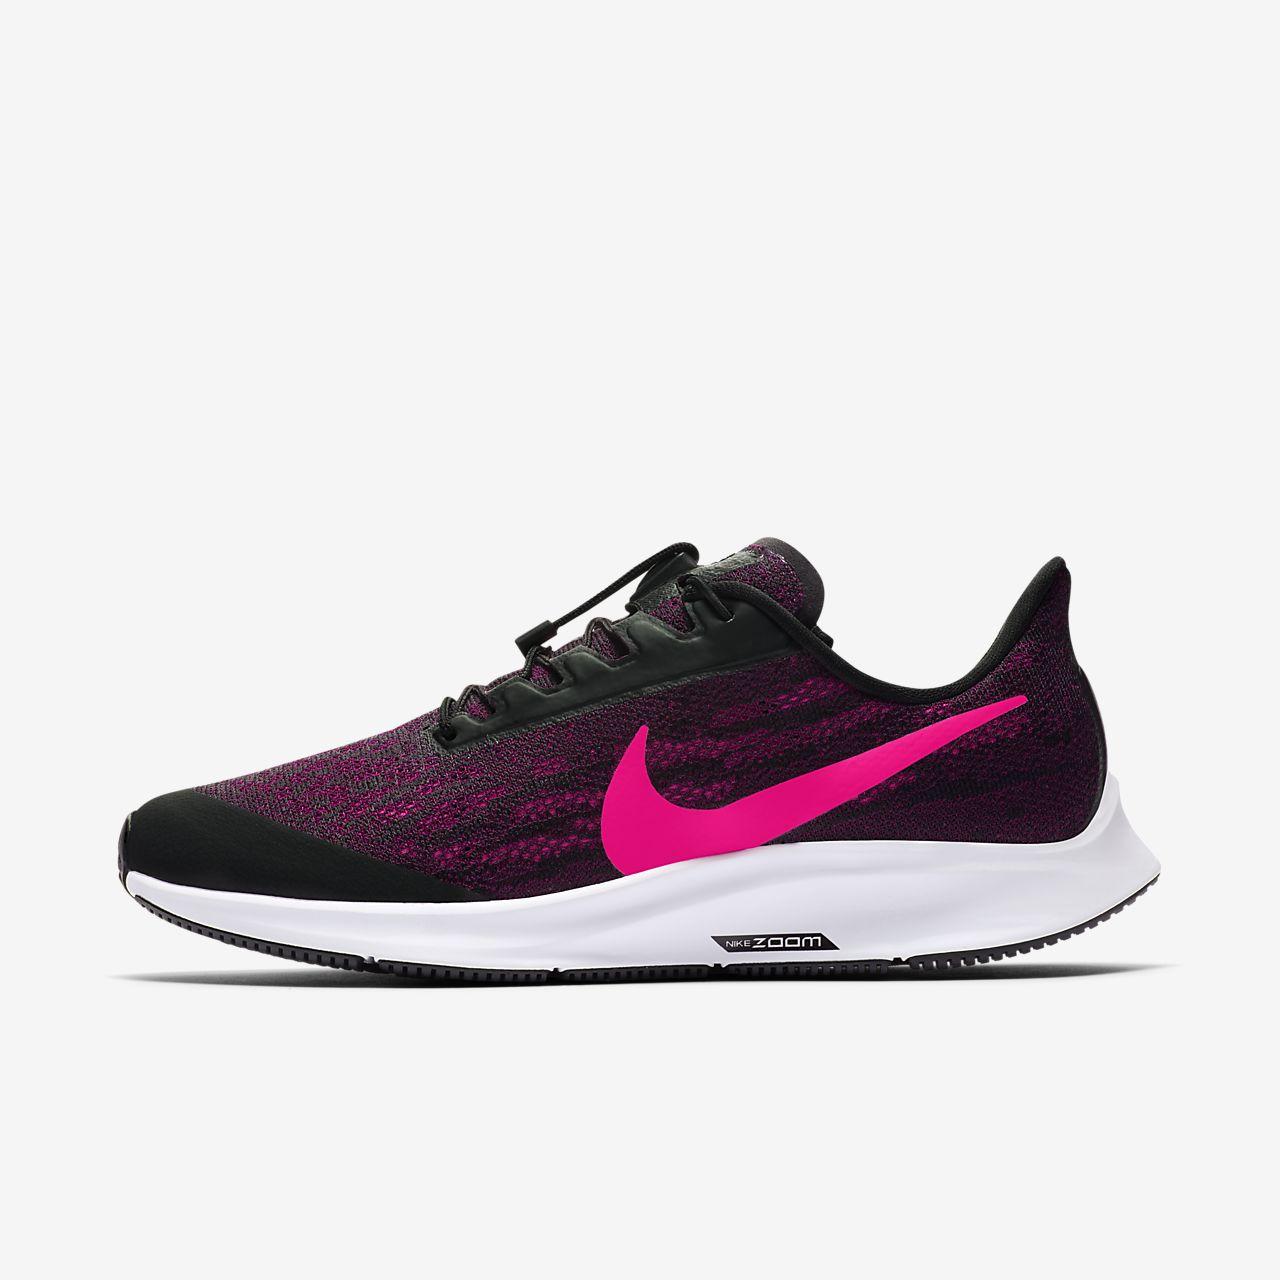 Sapatilhas de running Nike Air Zoom Pegasus 36 FlyEase para mulher